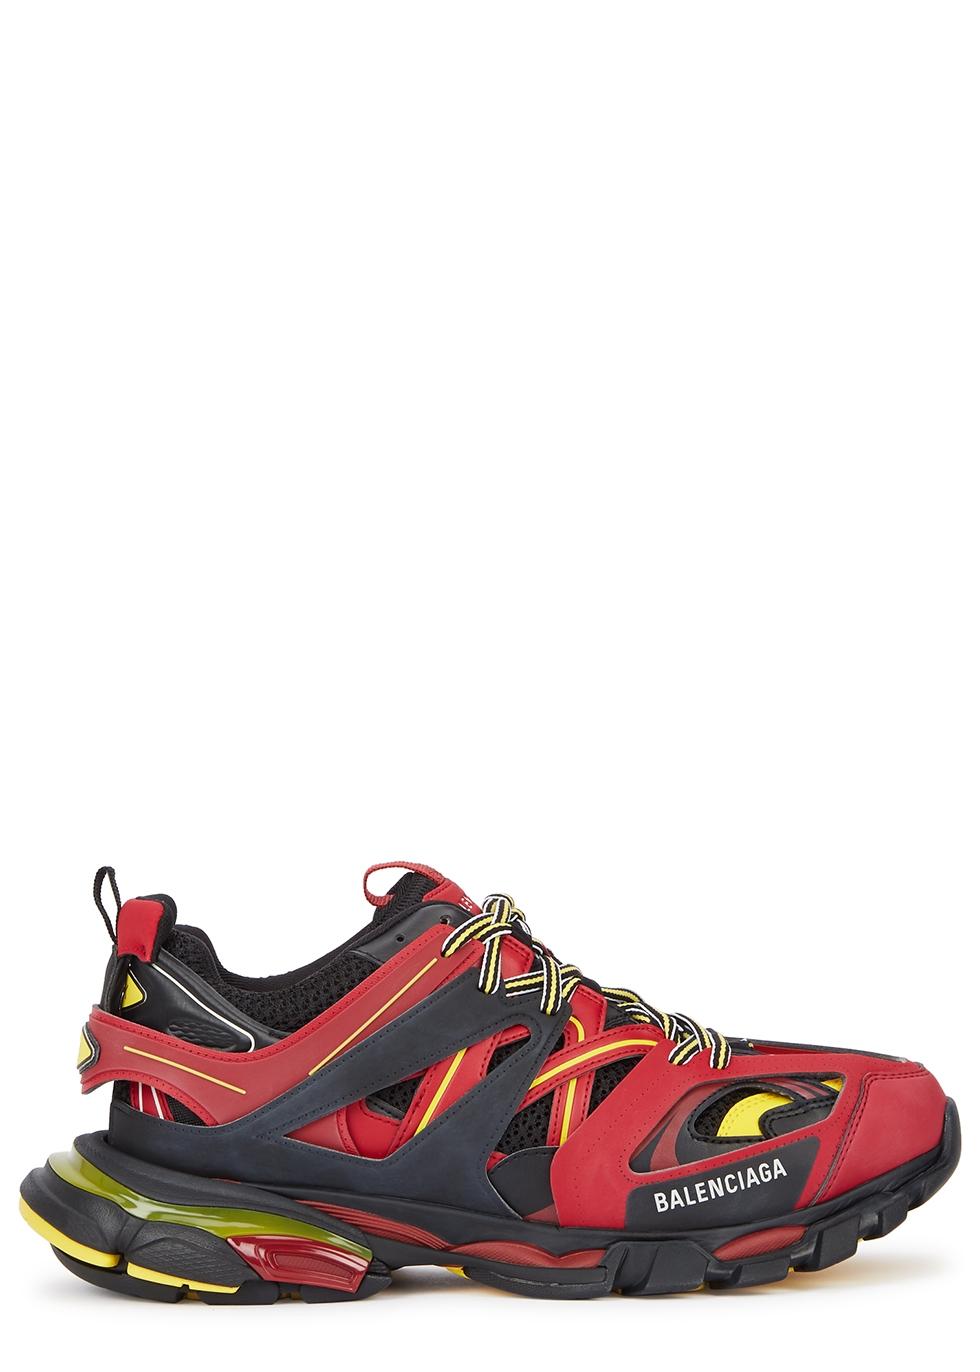 TrainersSneakersamp; Nichols Designer Sports Shoes Men's Harvey Ygyfb7v6